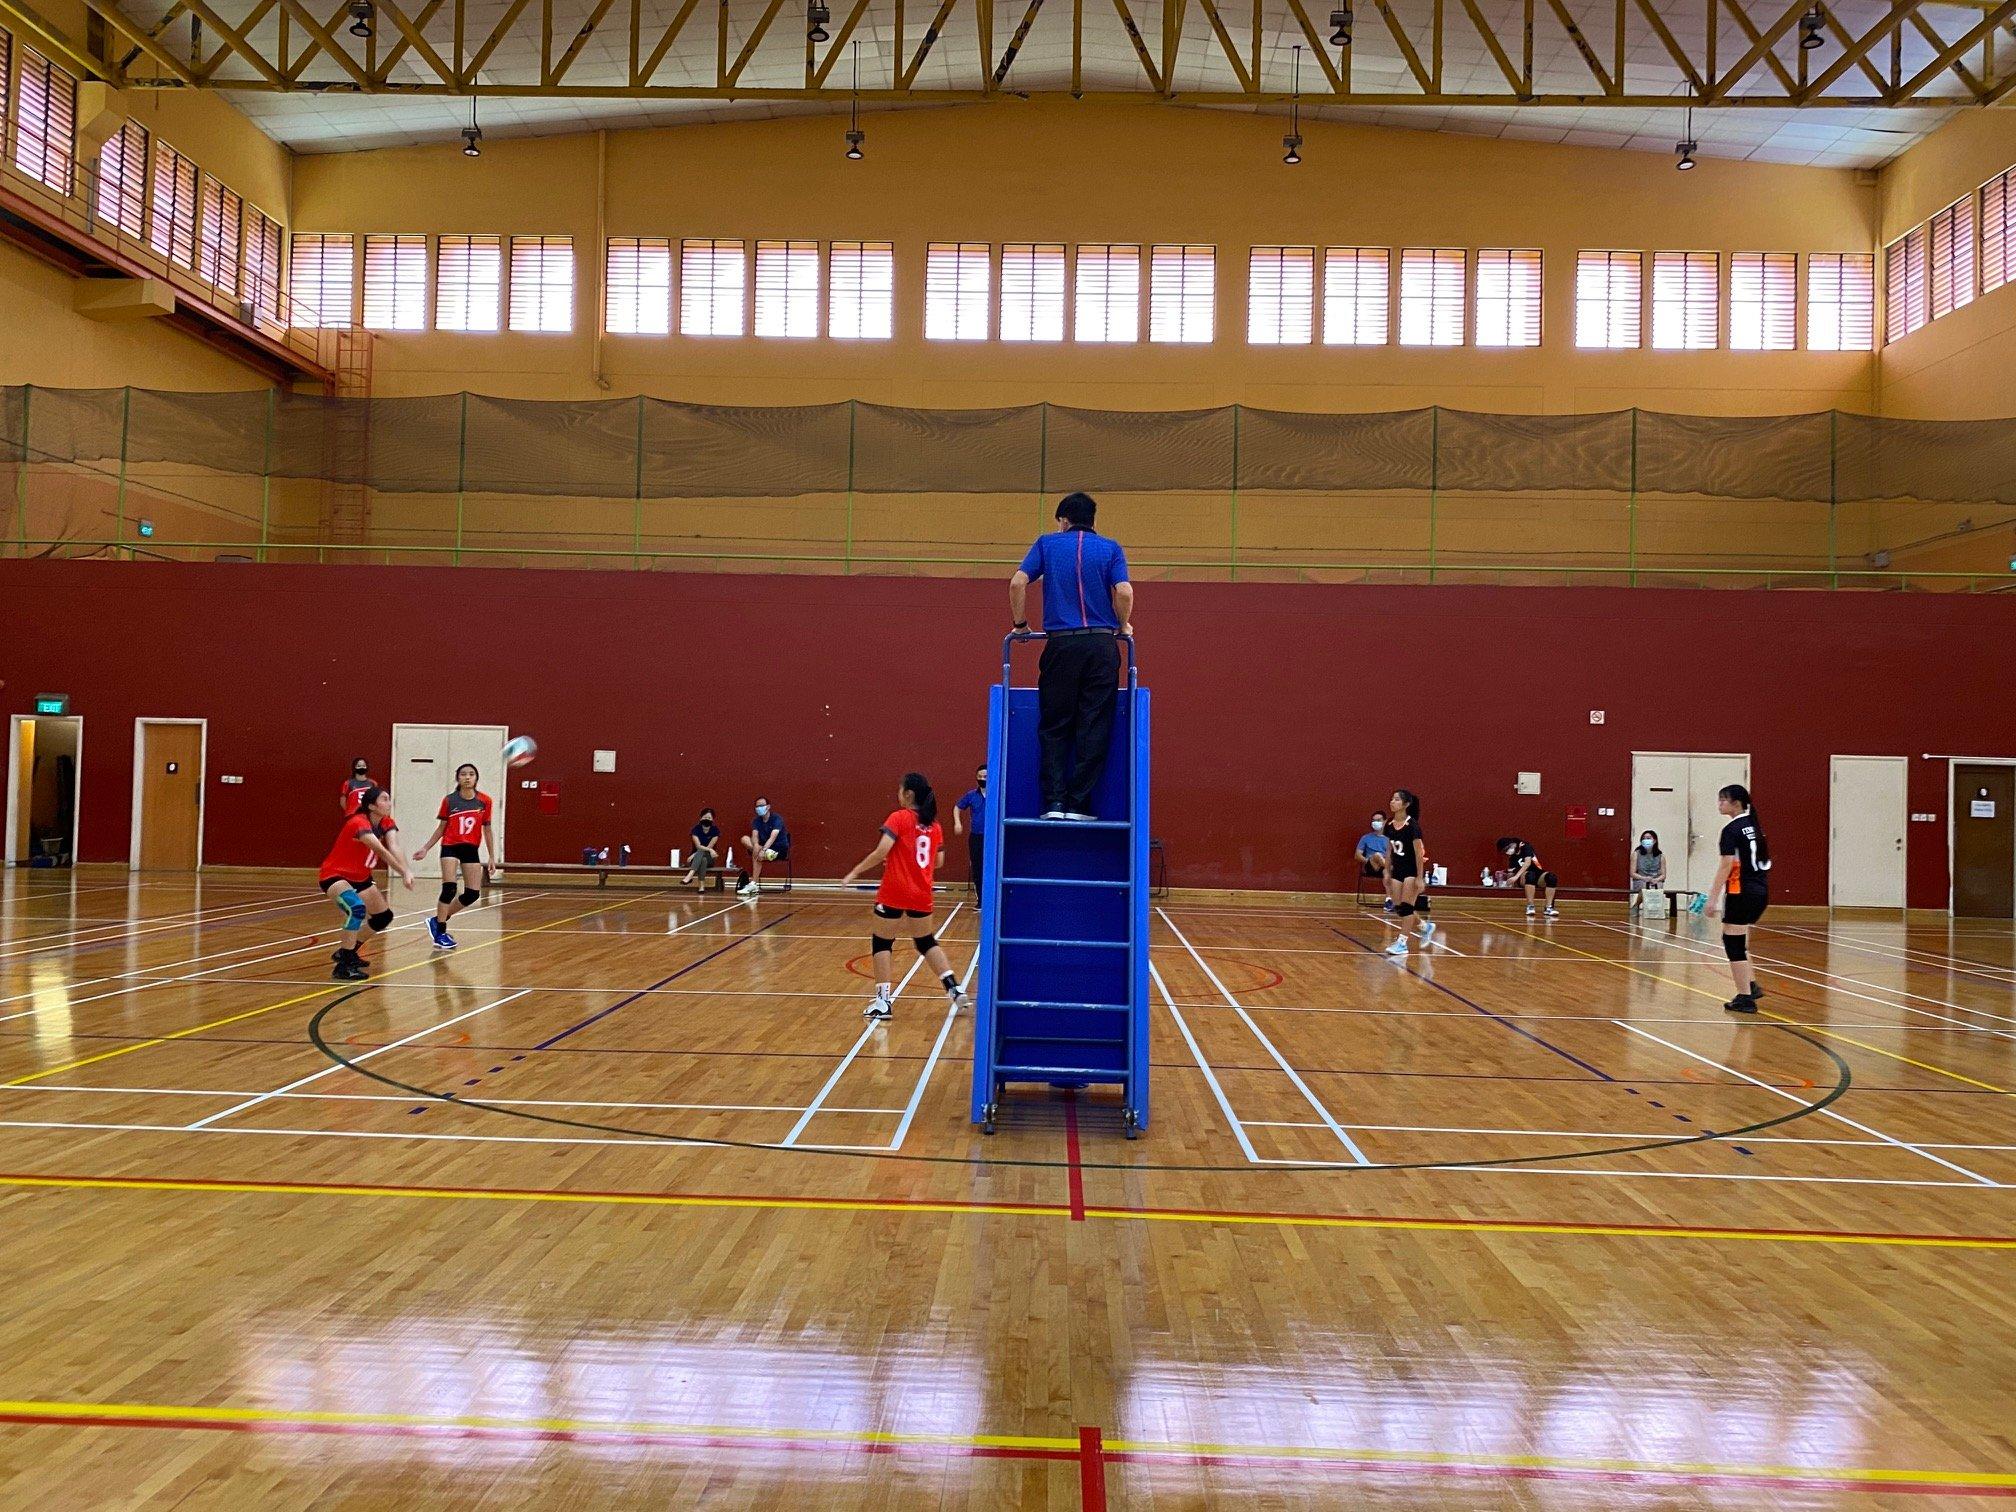 NSG A Div girls' volleyball prelim rd - ACJC (red) vs TJC (black)